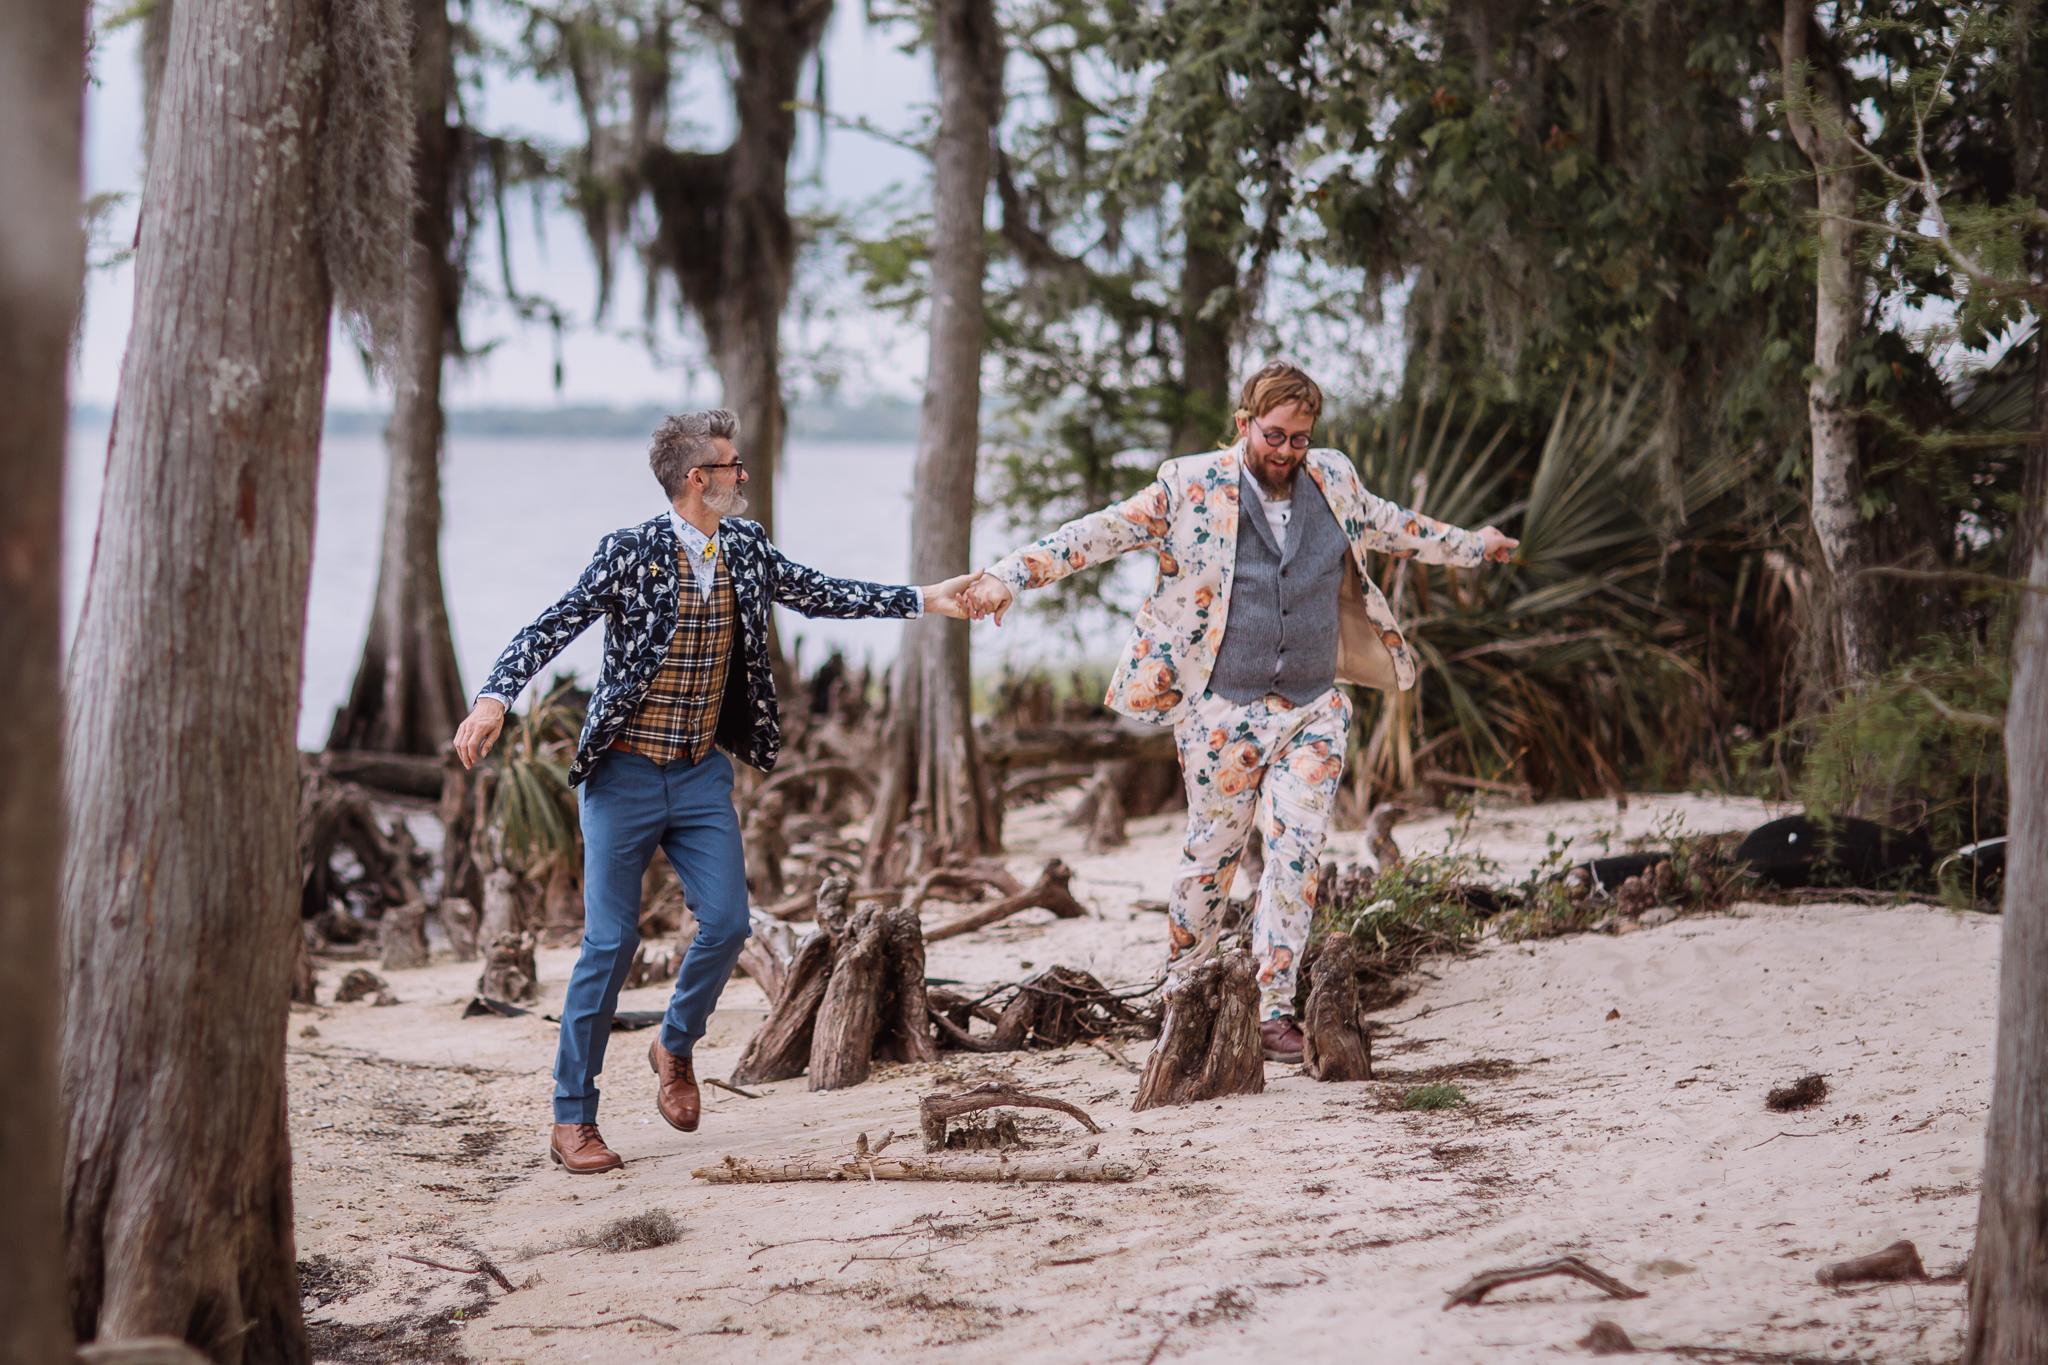 Tim and David - New orleans Wedding - Kallistia Photography-5.jpg